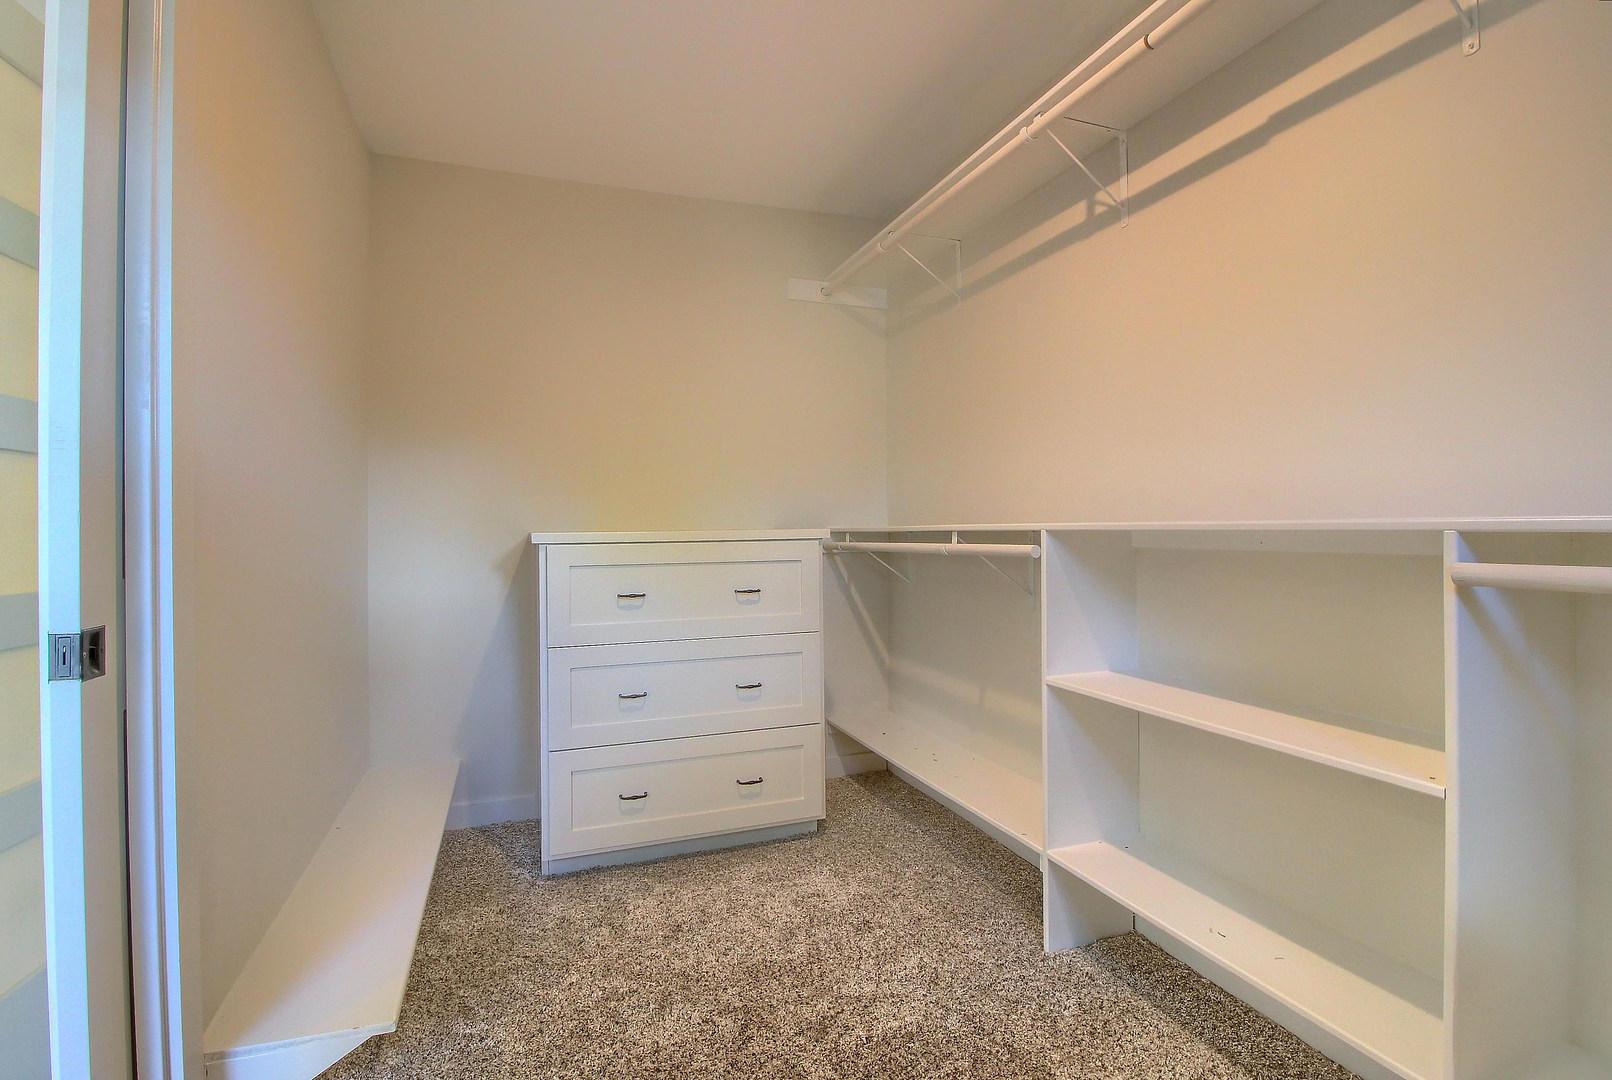 Home Renovation Master Closet Shelving on Bouldin in Austin, TX